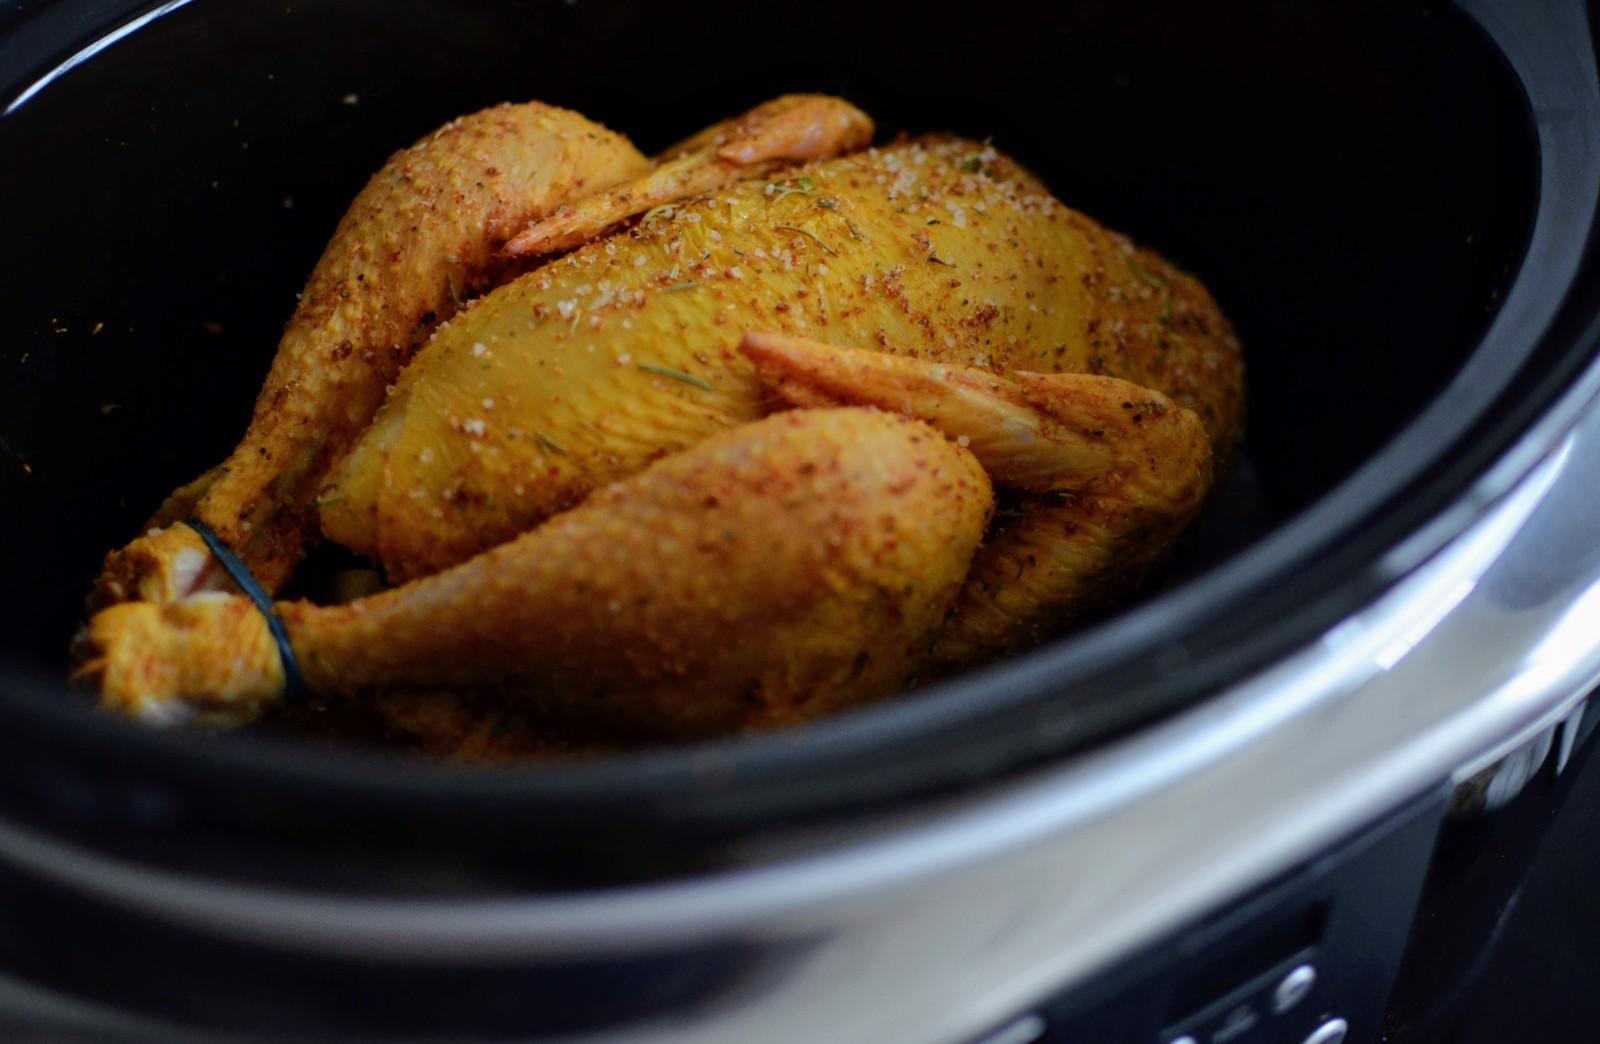 Herb-rubbed chicken in Crock-Pot